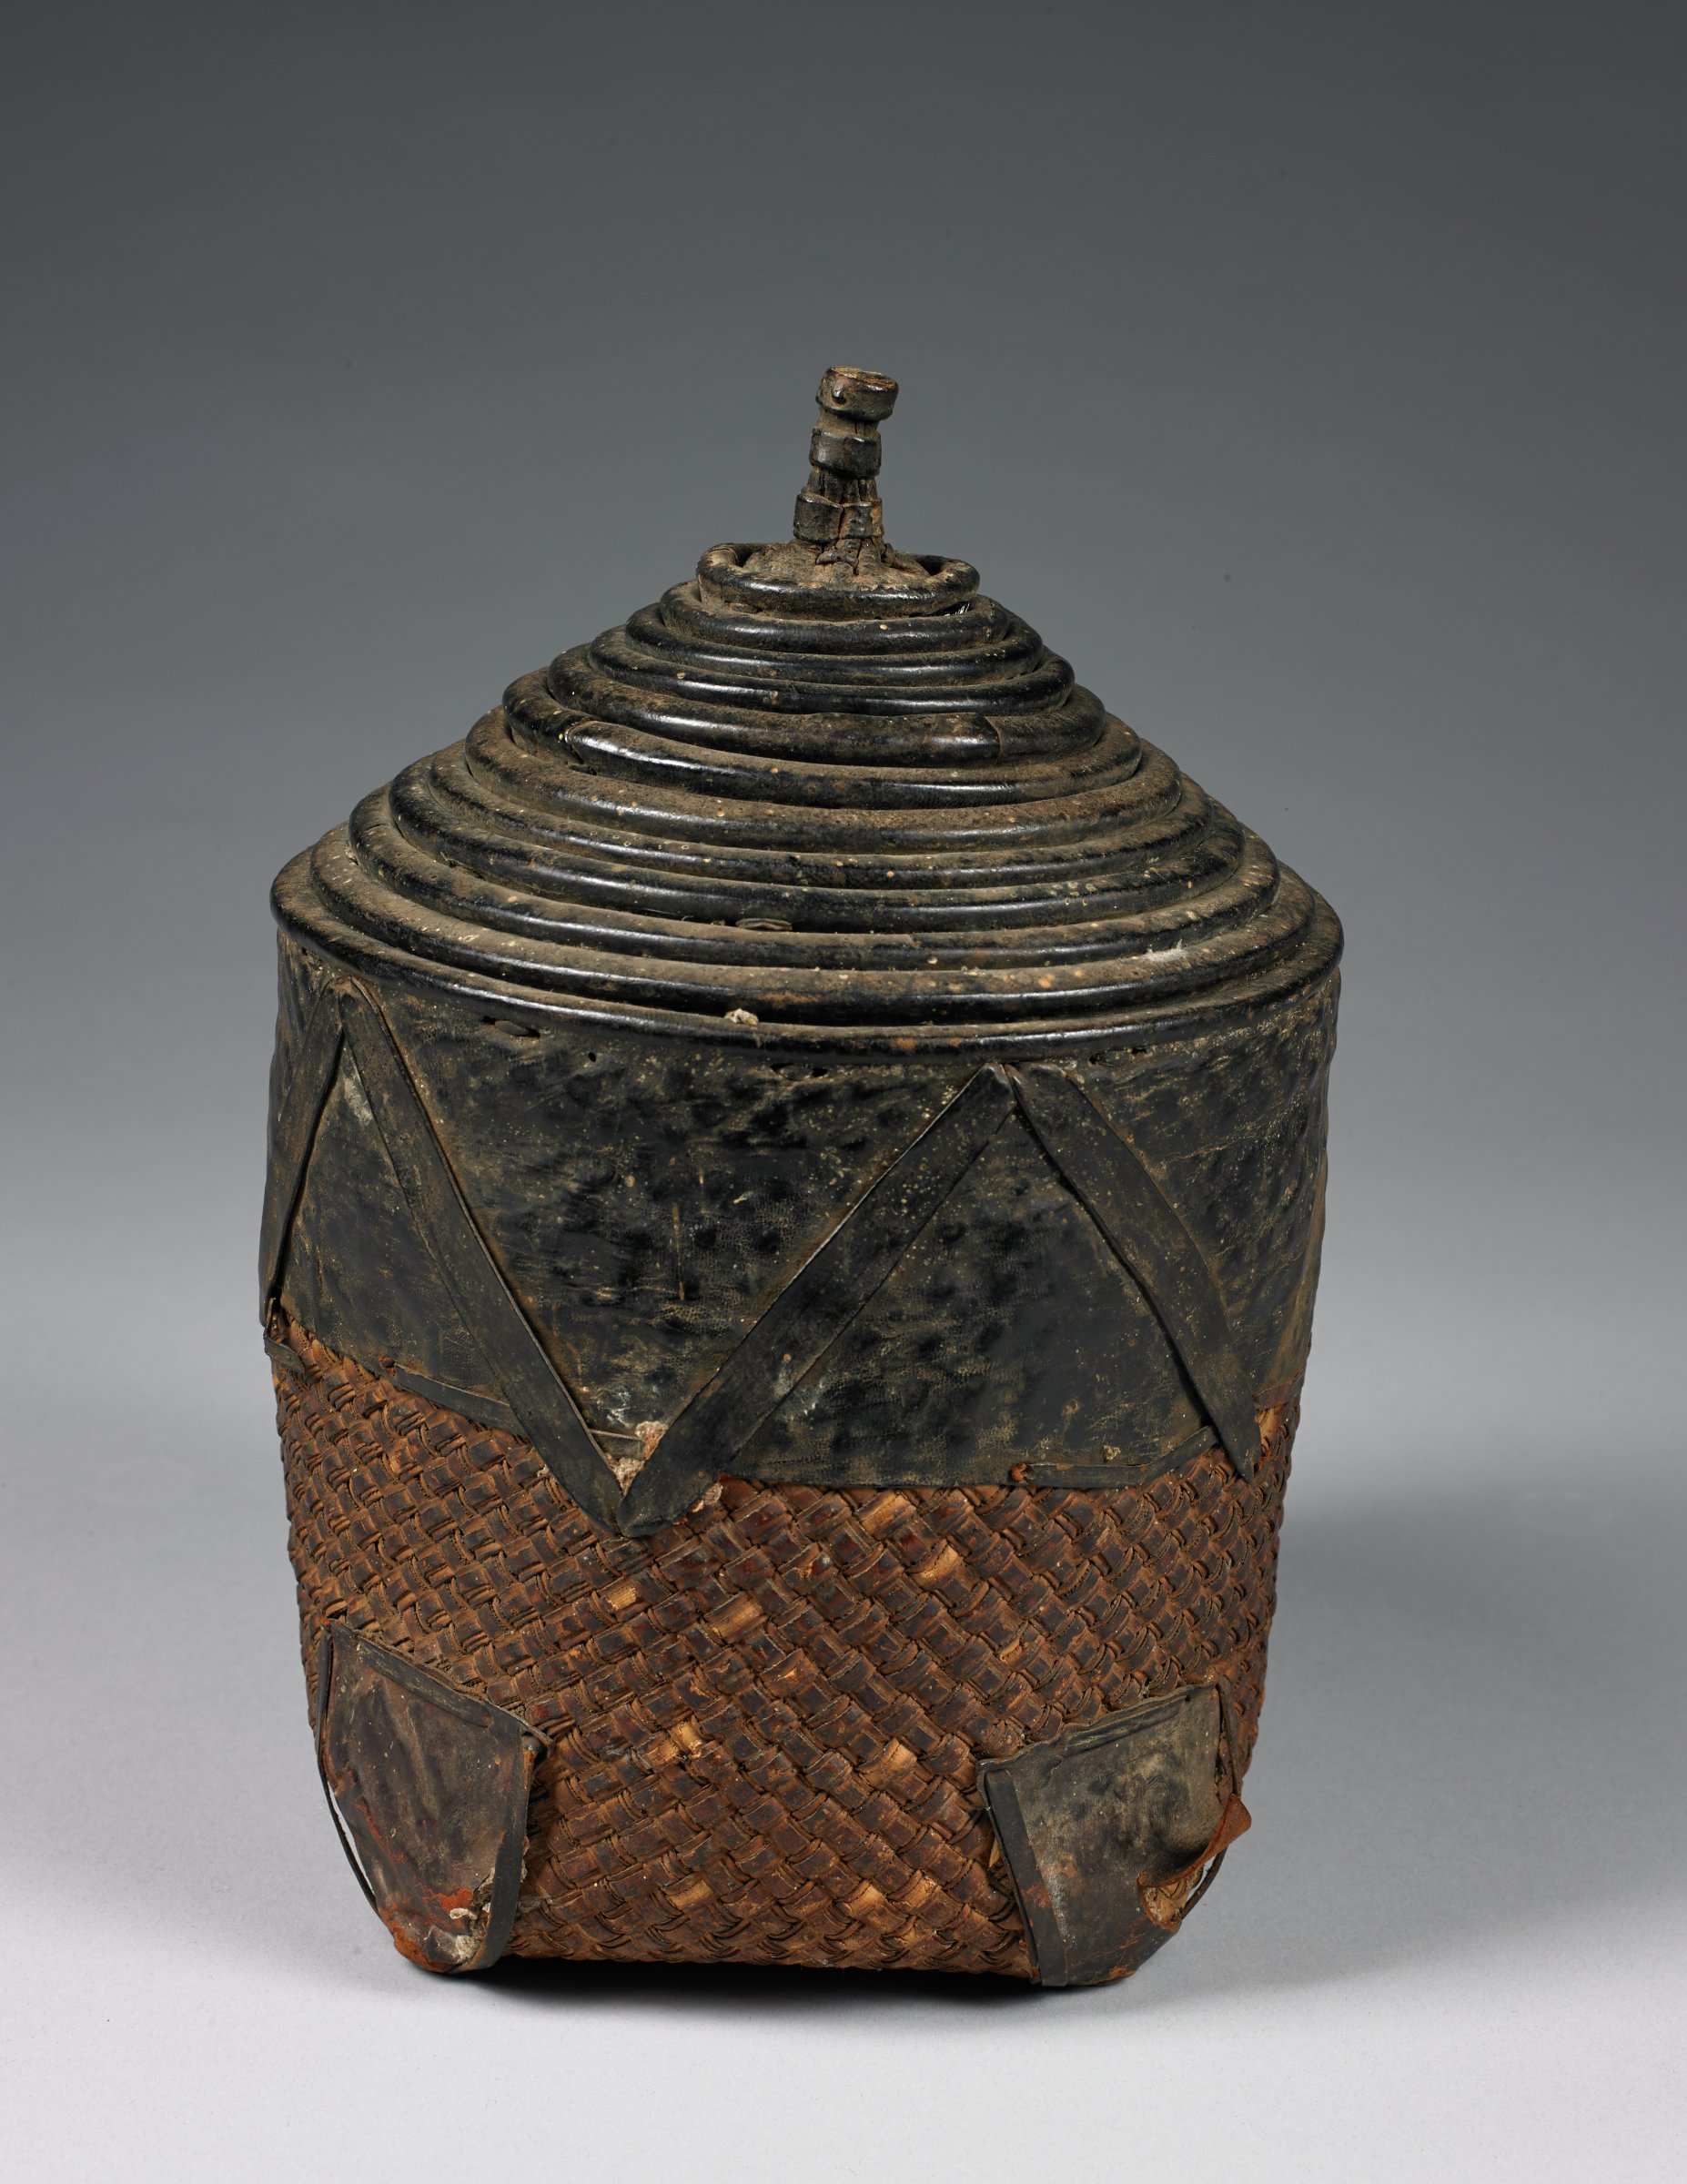 Nesting Baskets, Lobi people, Côte d'Ivoire, African, fiber, leather, string, metal, wood